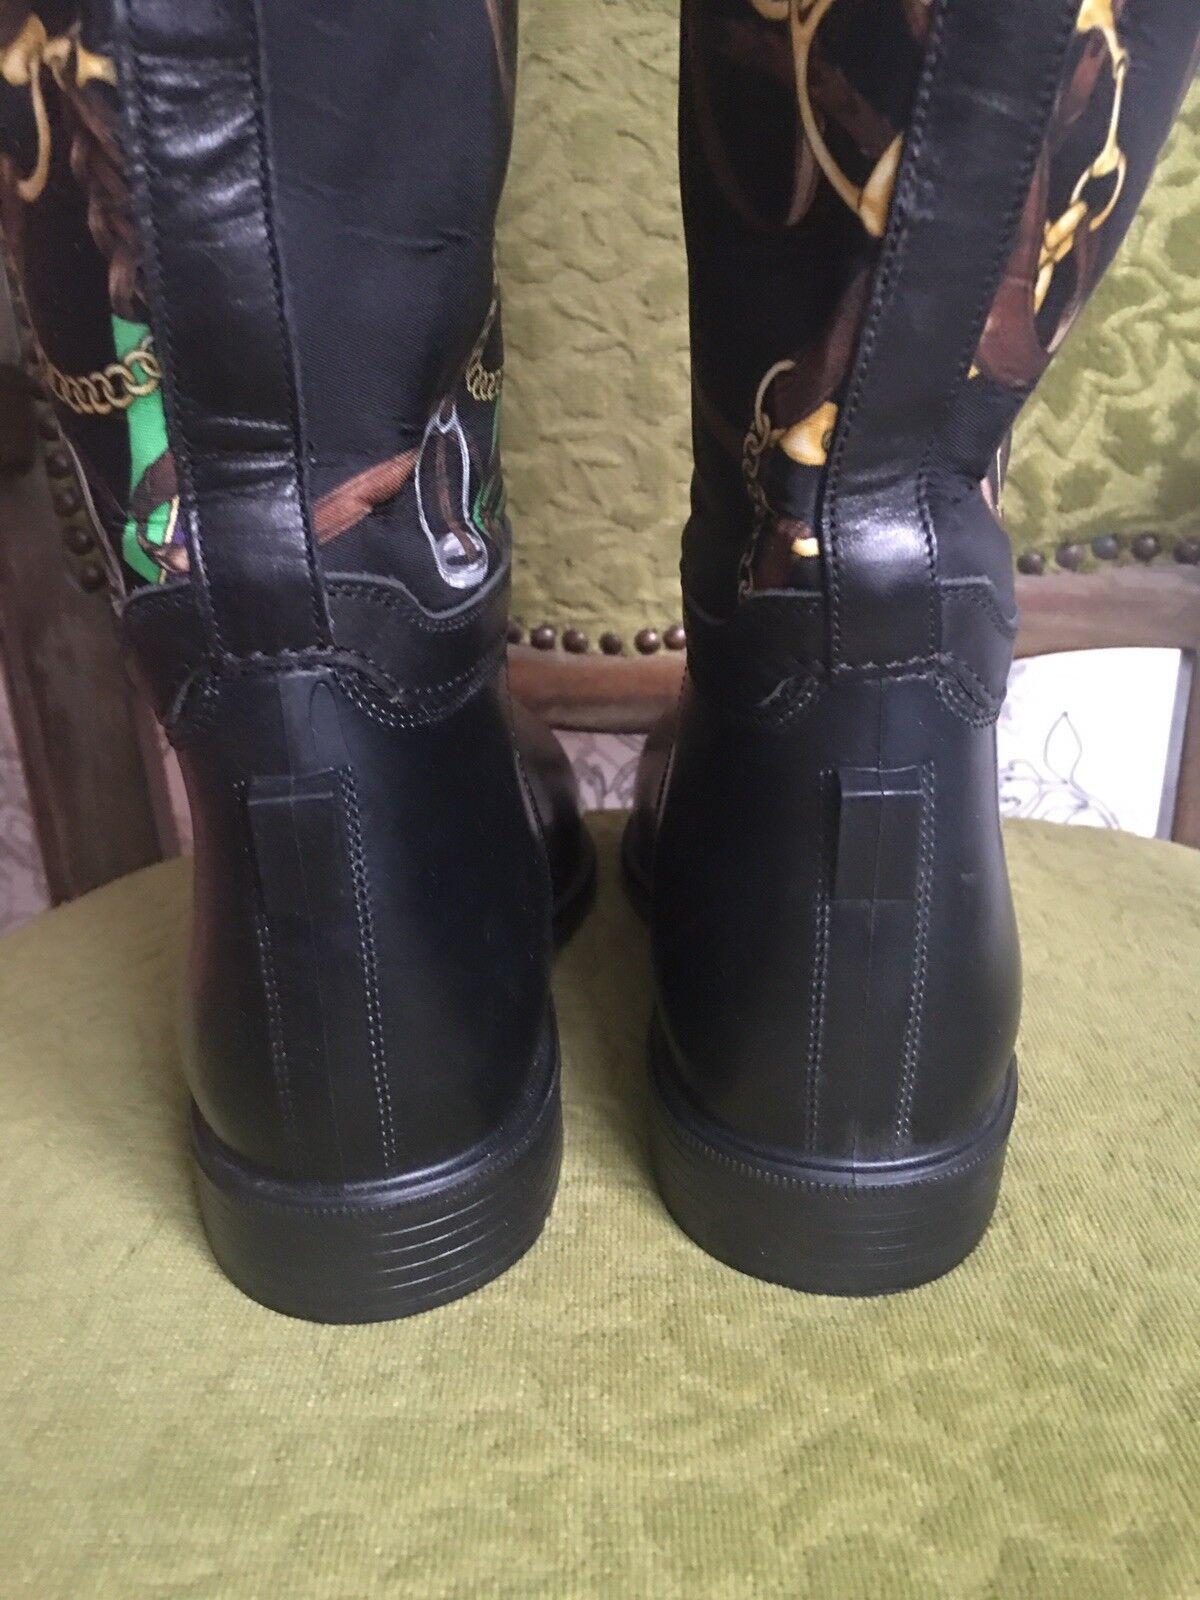 RALPH LAUREN LAUREN LAUREN damen Riding Rubber Leather Nylon  Stiefel sz 7 B -7,5 Mint 6b2347